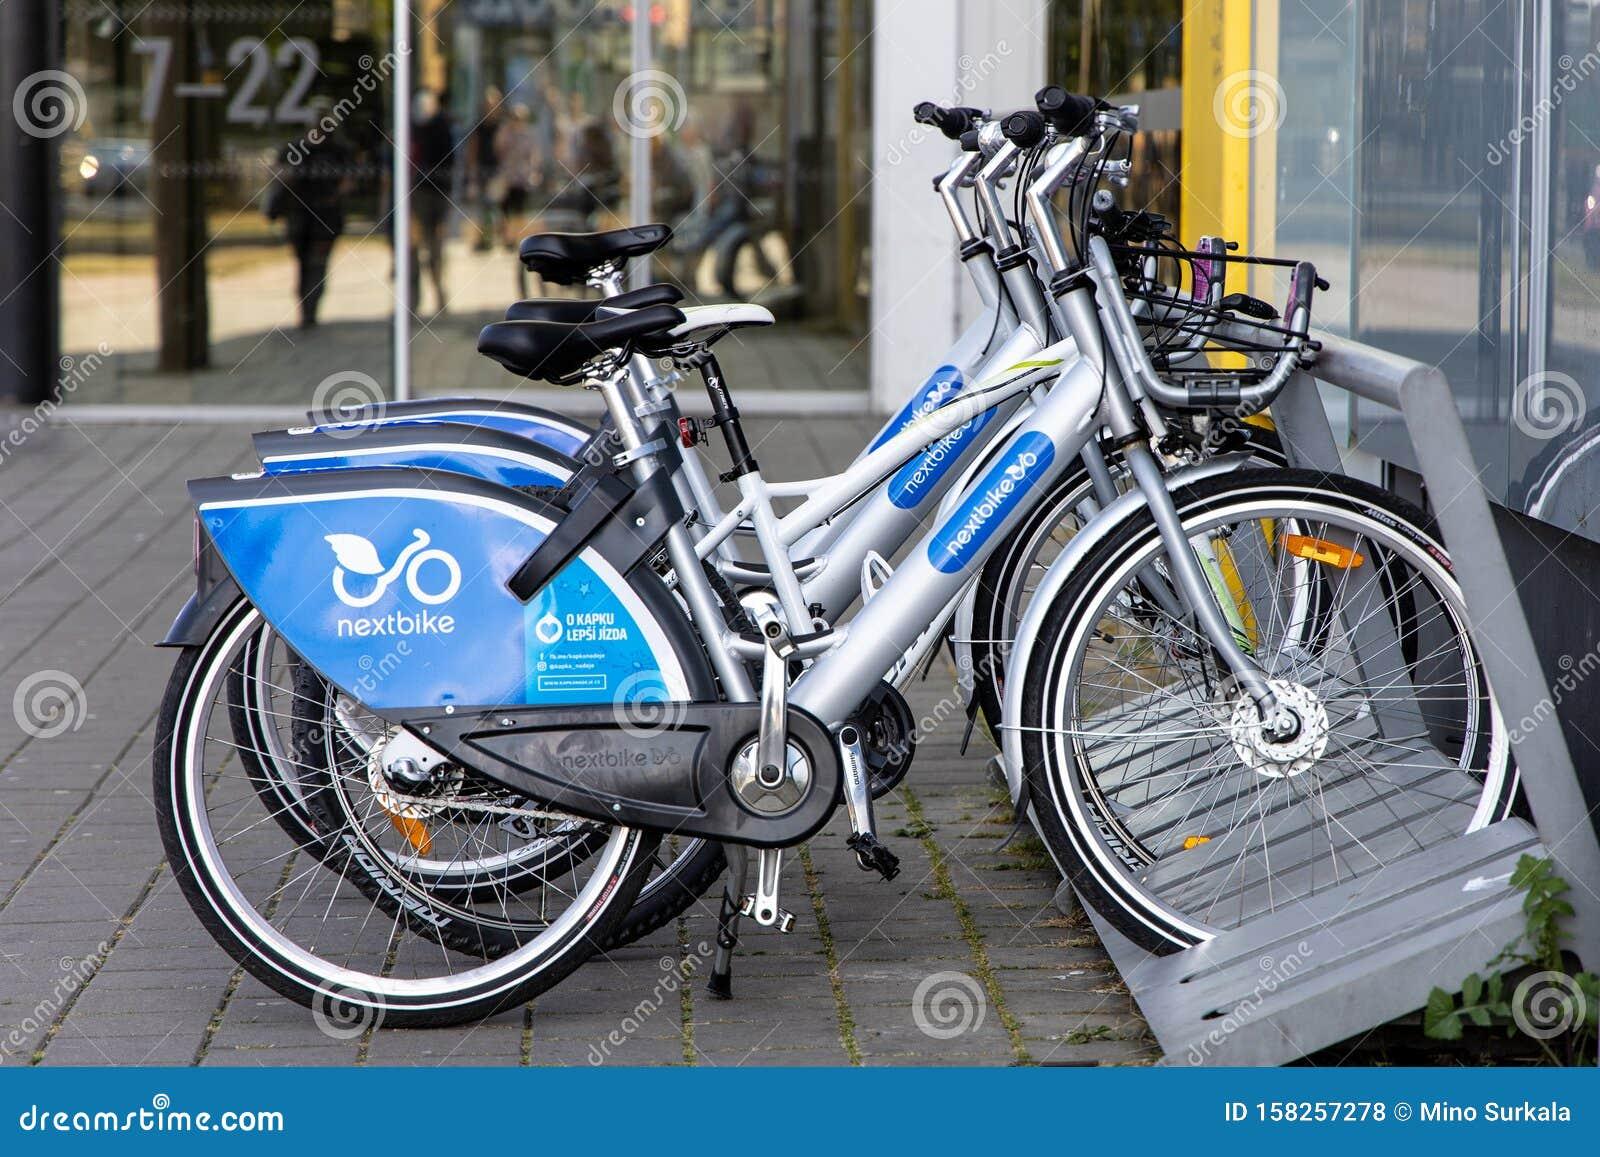 next bicycle company